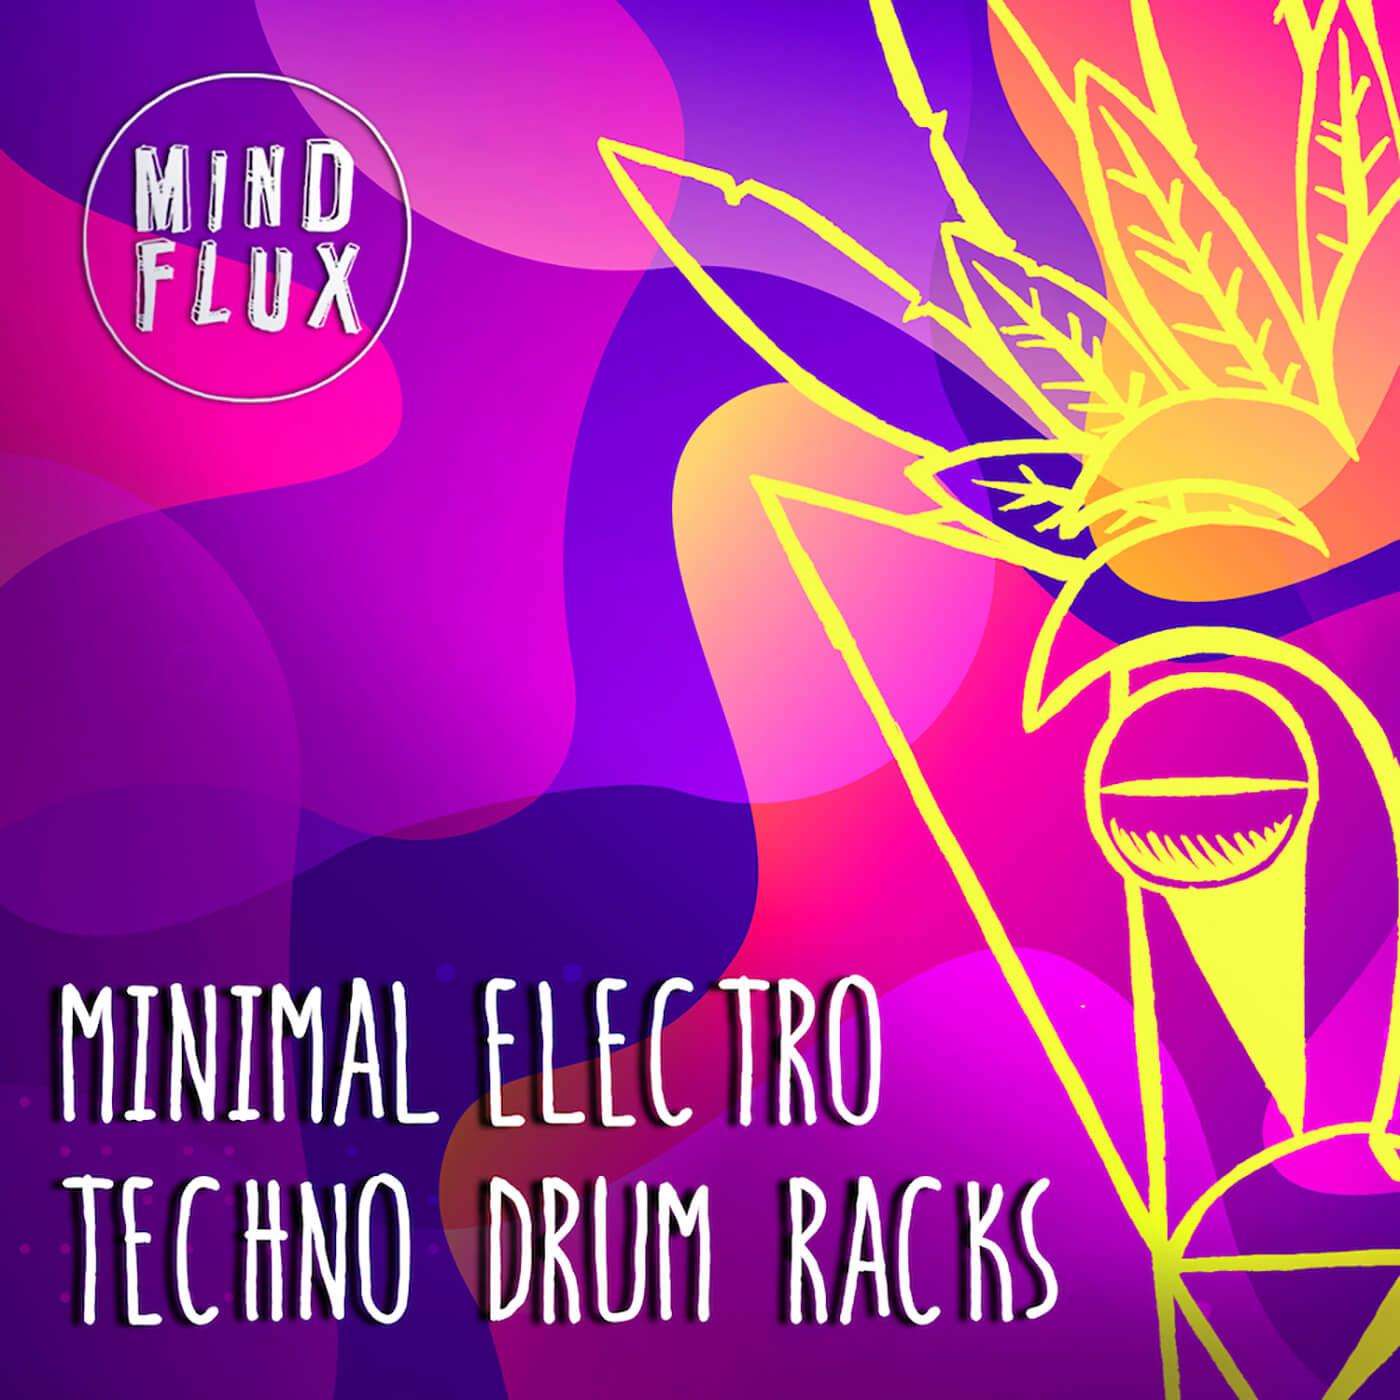 Mind Flux - Minimal Electro Techno Drum Racks